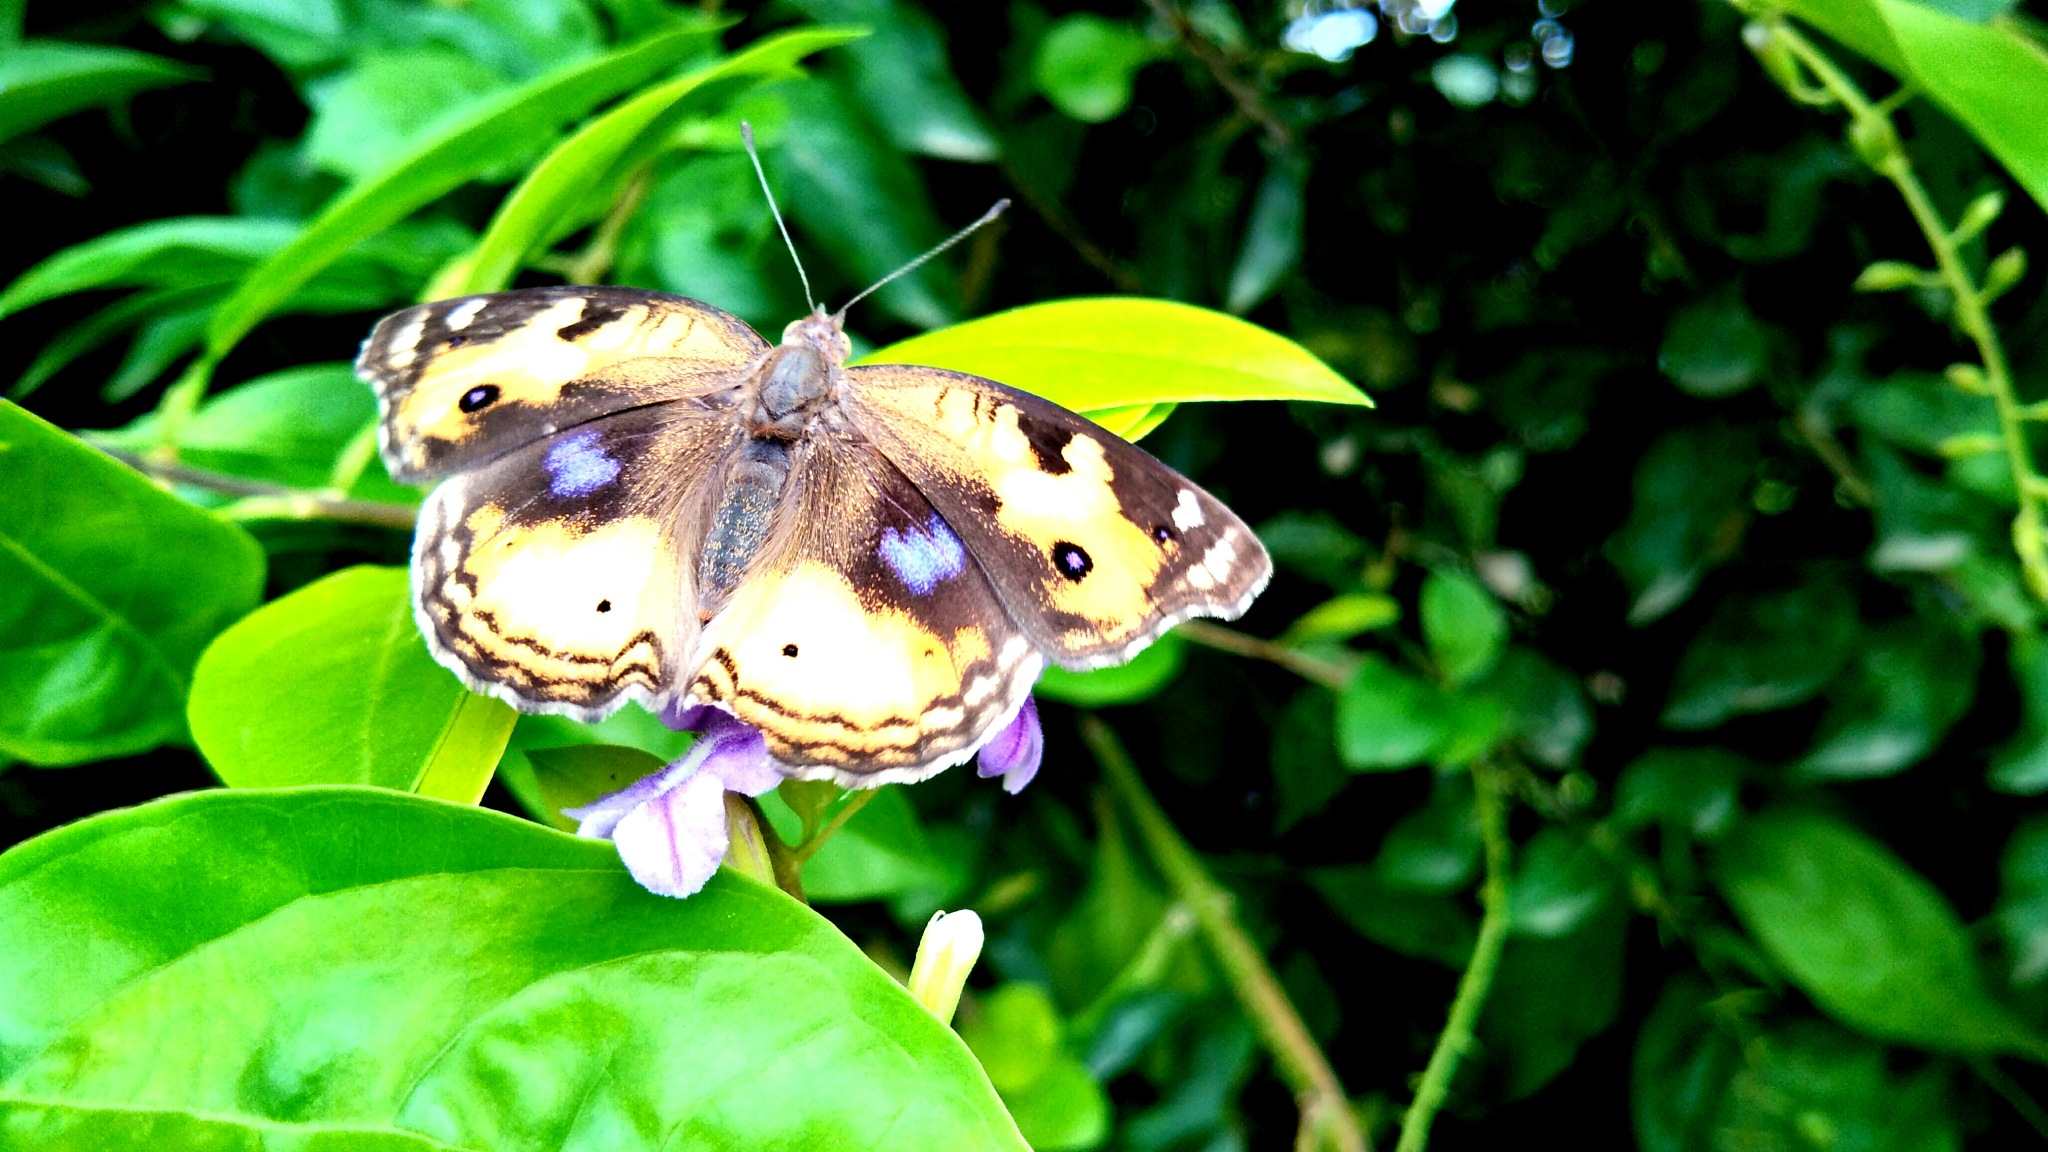 the butterfly  by mandeepsinghdeep99